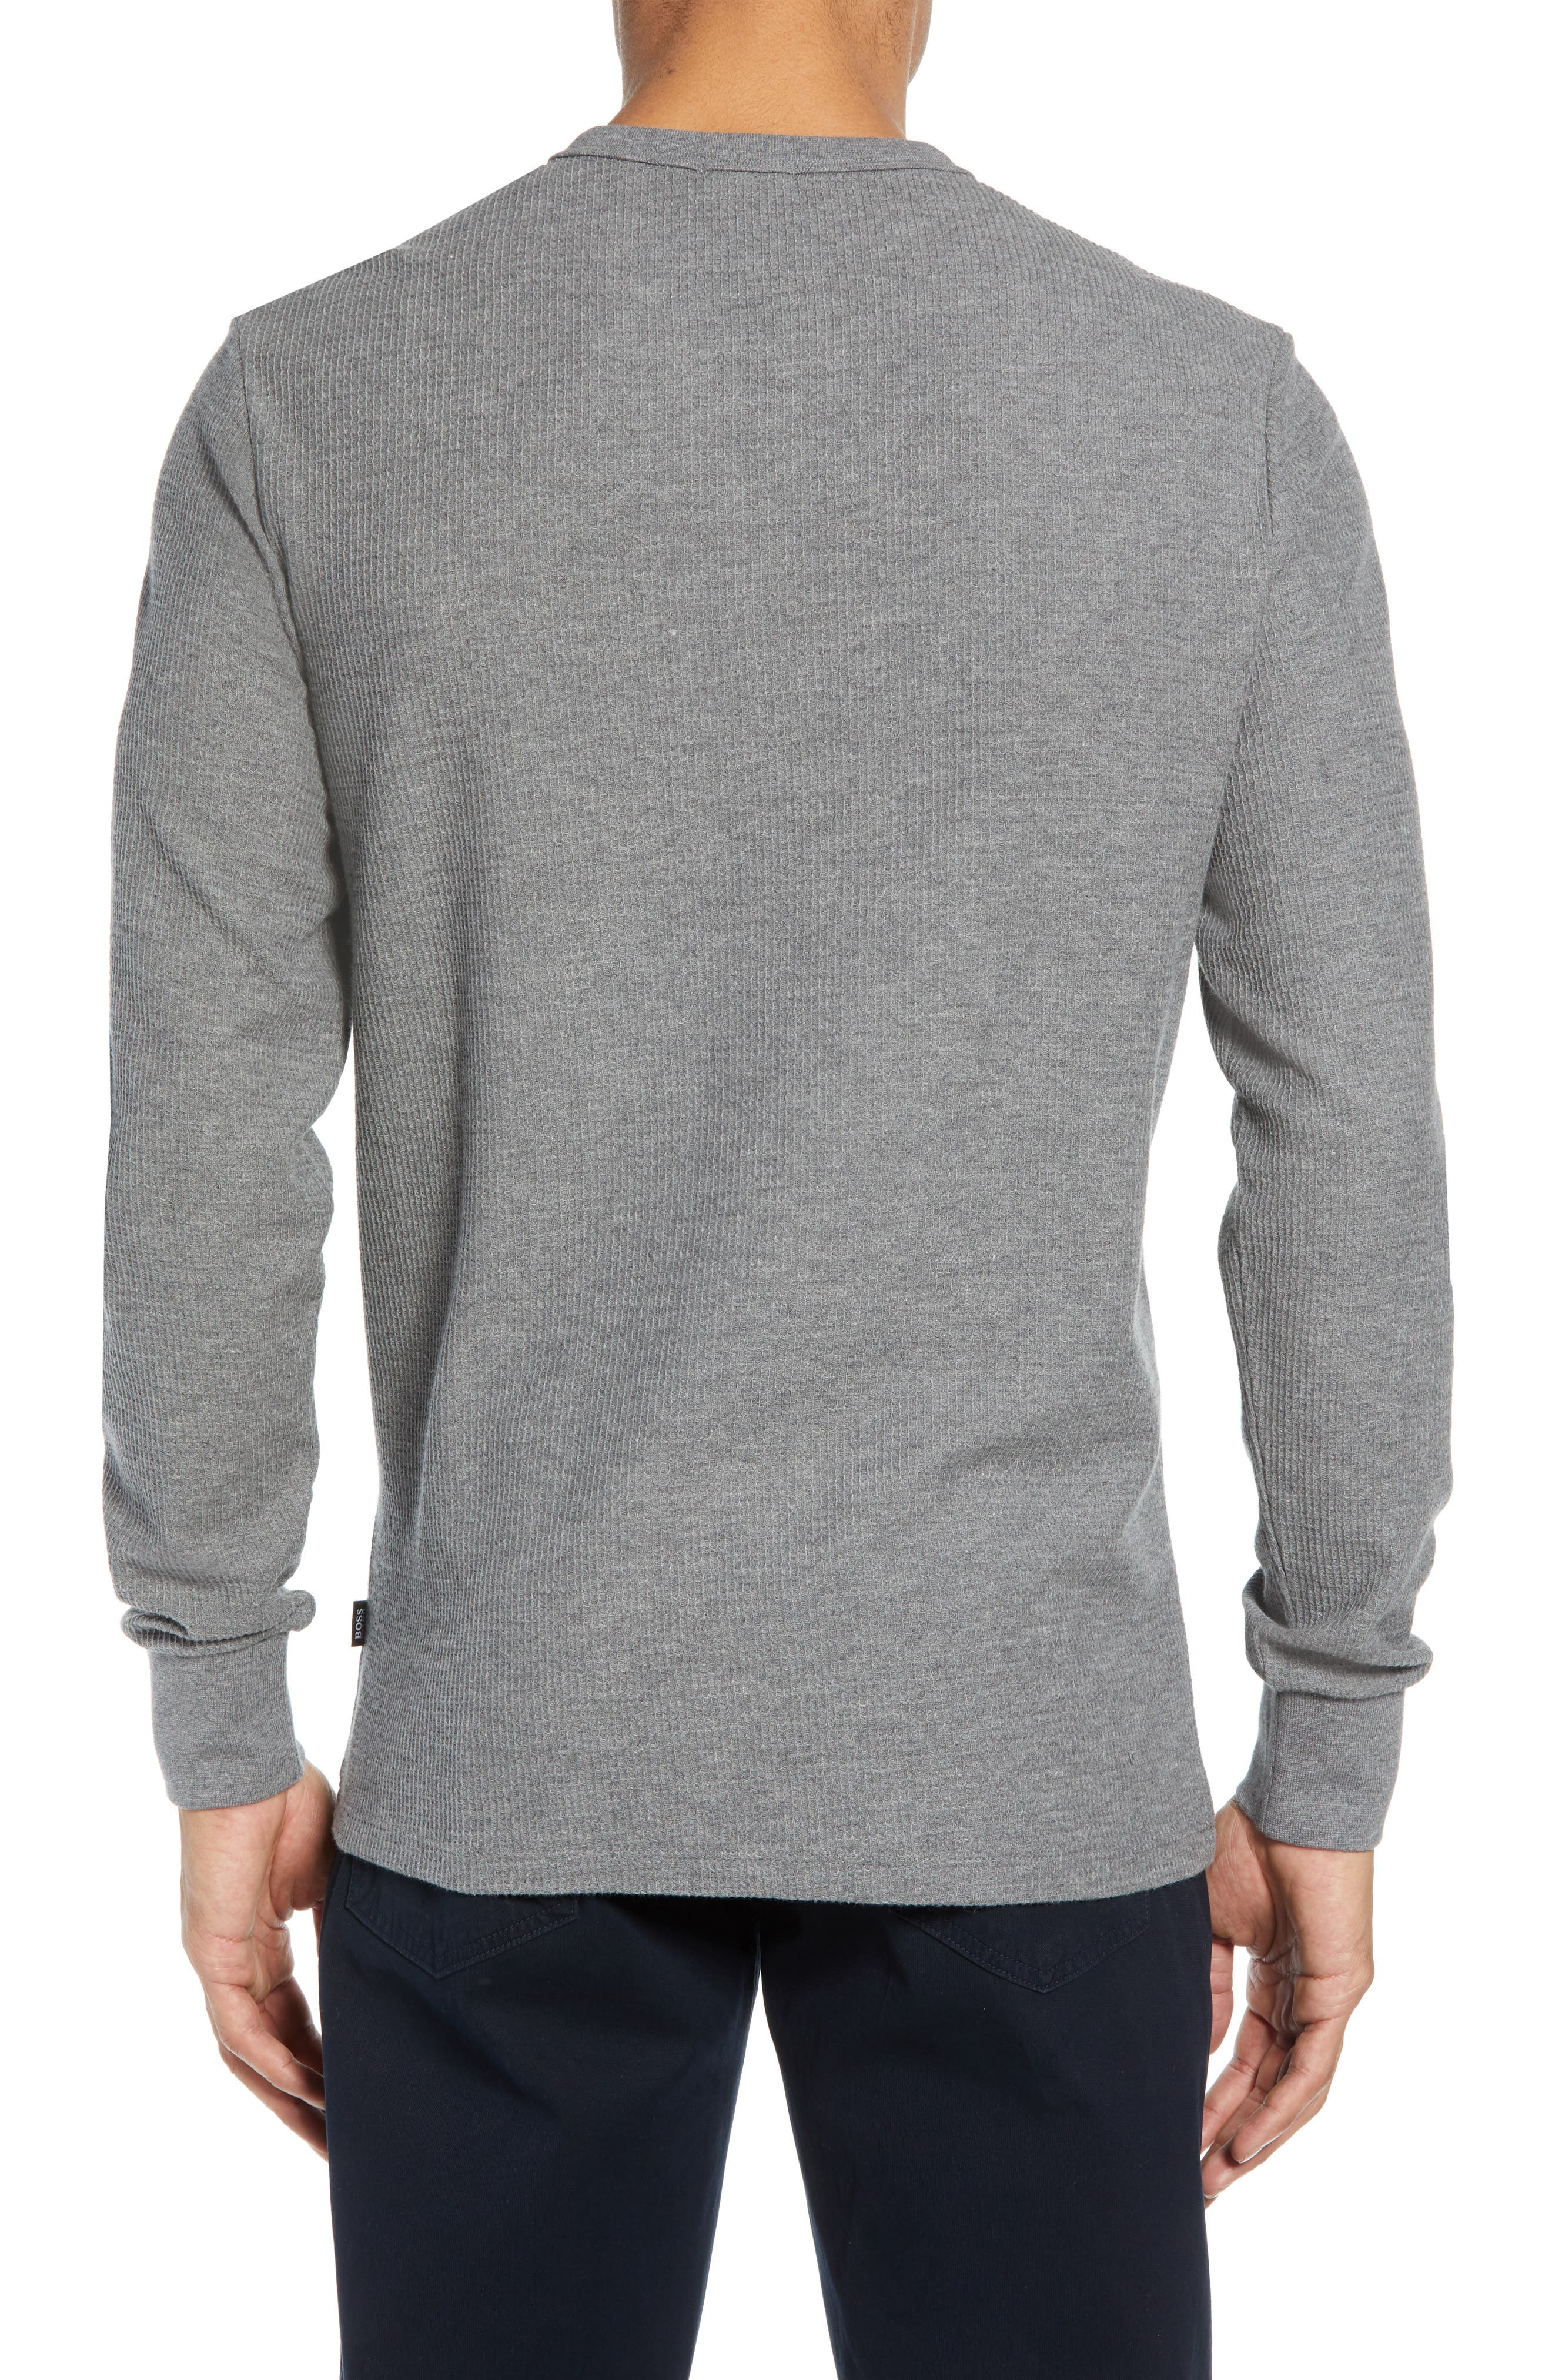 Textor Quarter Zip Thermal T-Shirt,                             Alternate thumbnail 2, color,                             GREY